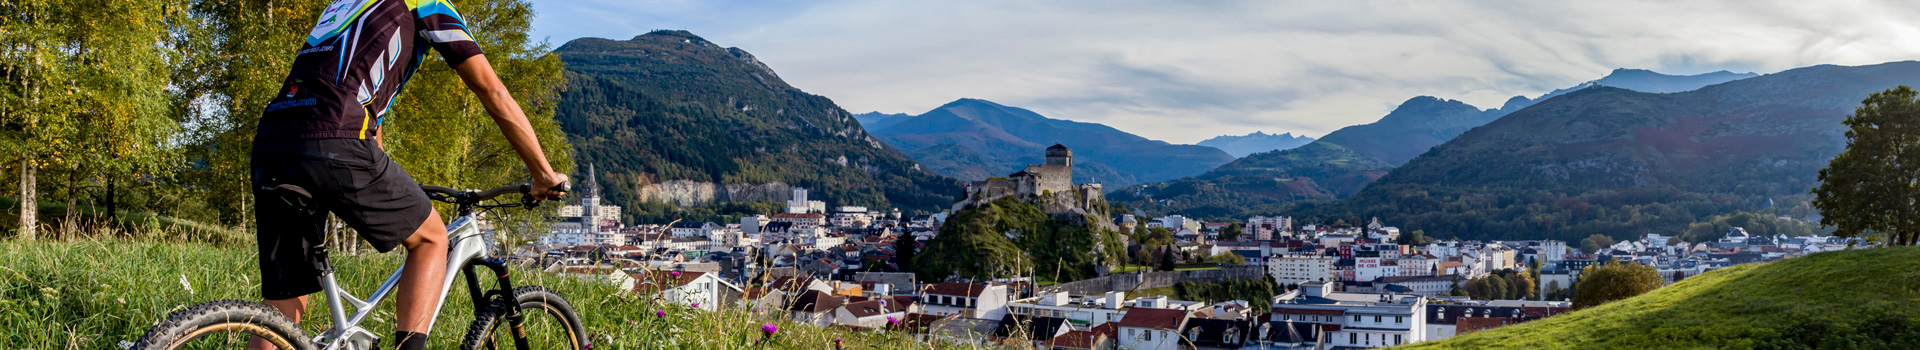 panoramique-VTT-Lourdes-2